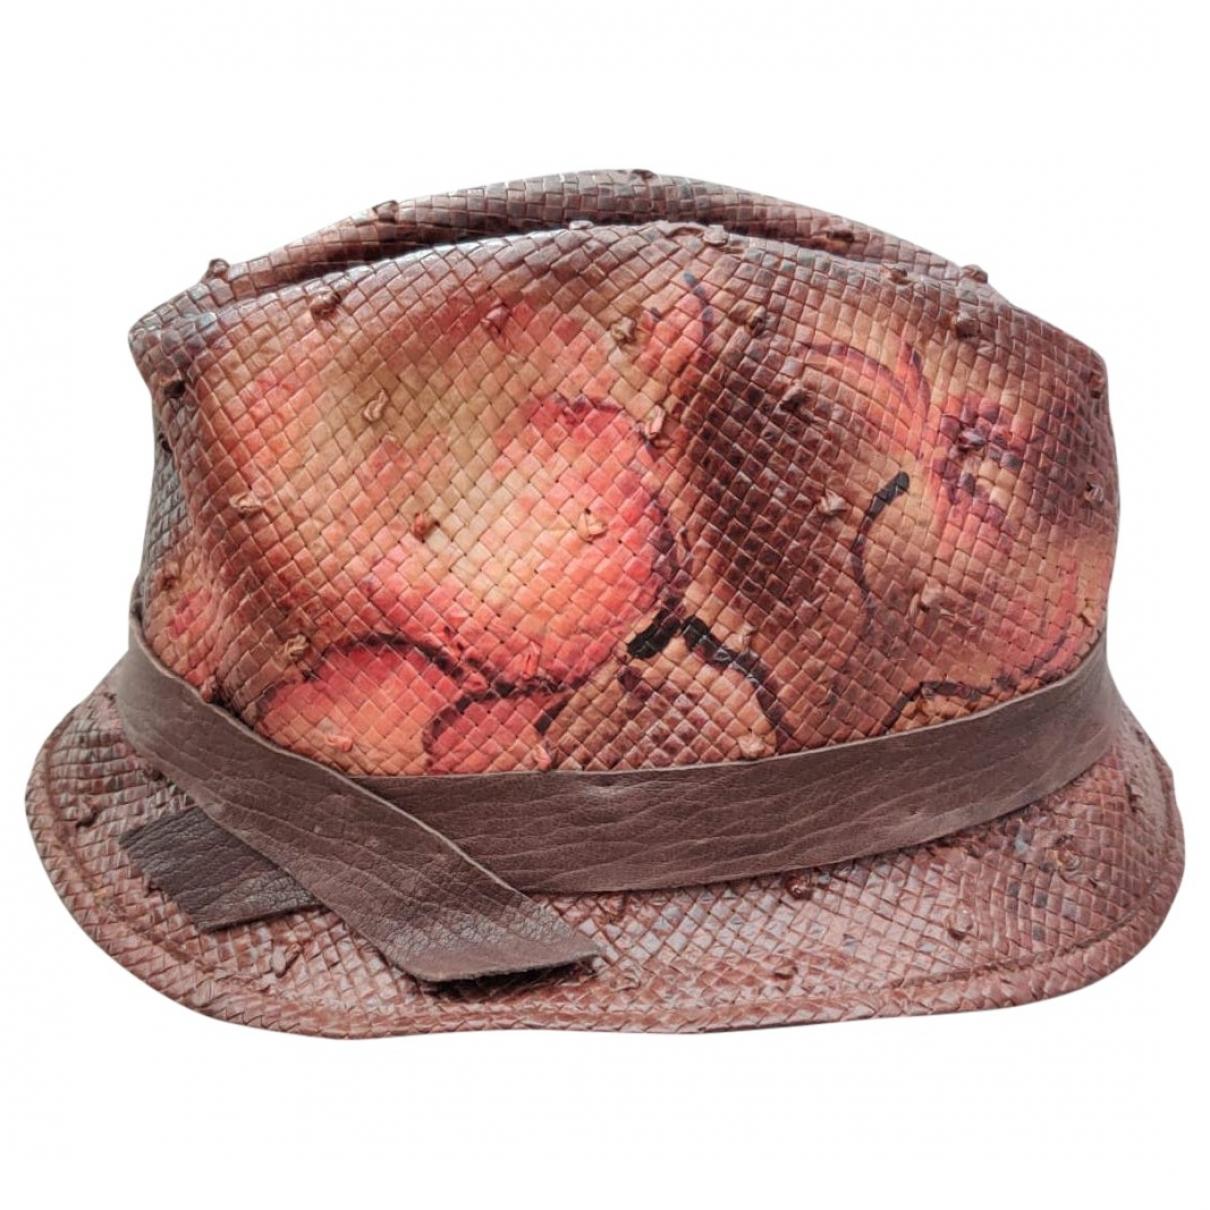 Brunello Cucinelli \N Brown Leather hat for Women S International